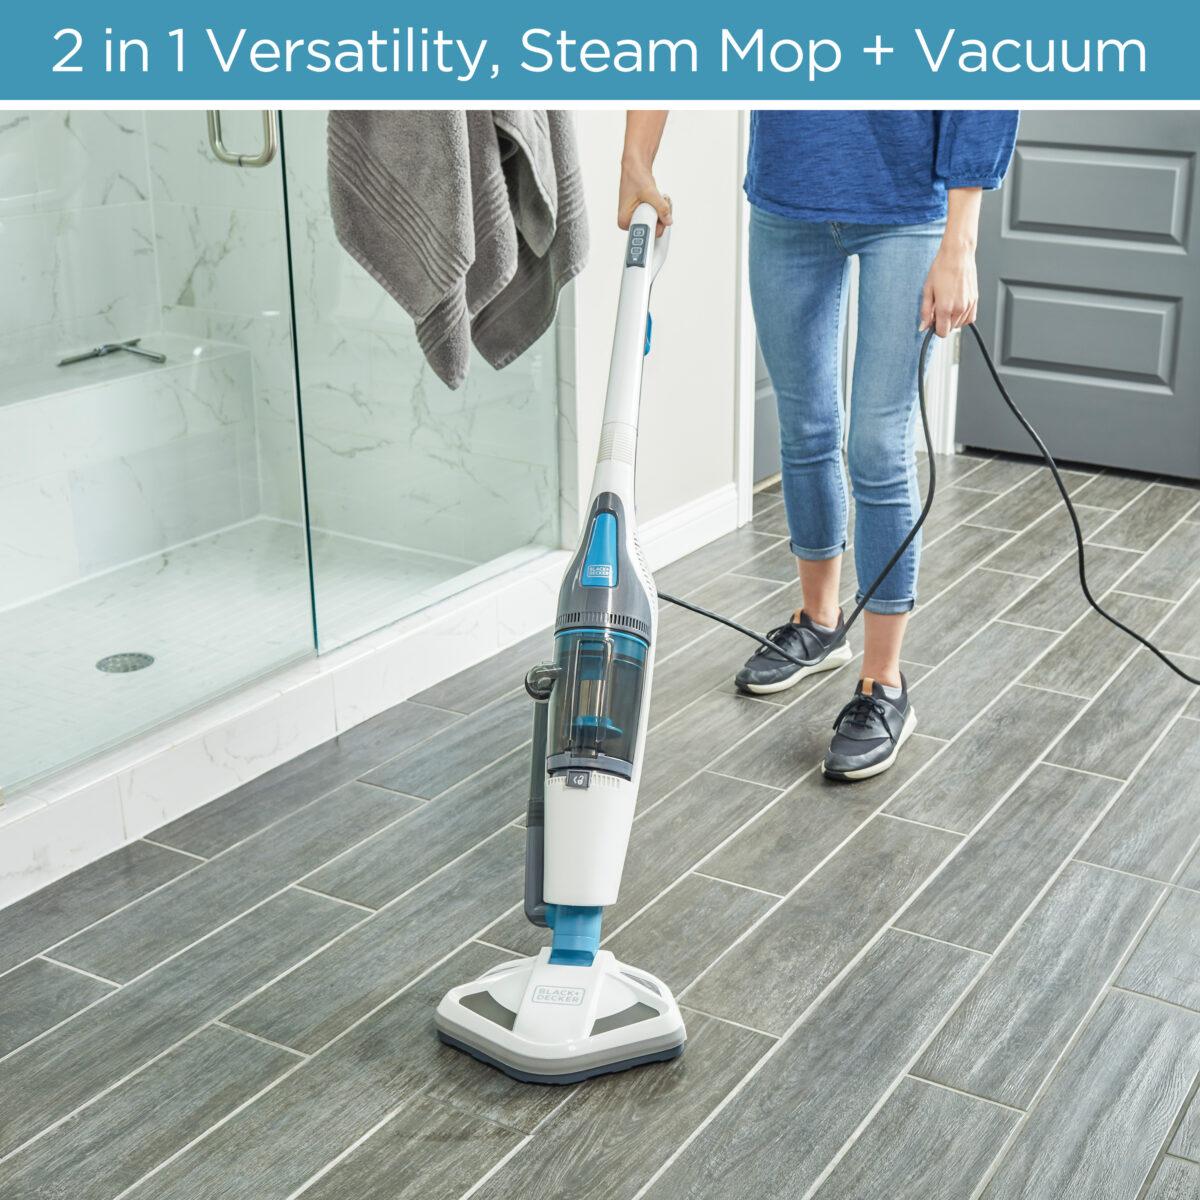 lady using a stem mop - Black + Decker Steam N' Vac Review